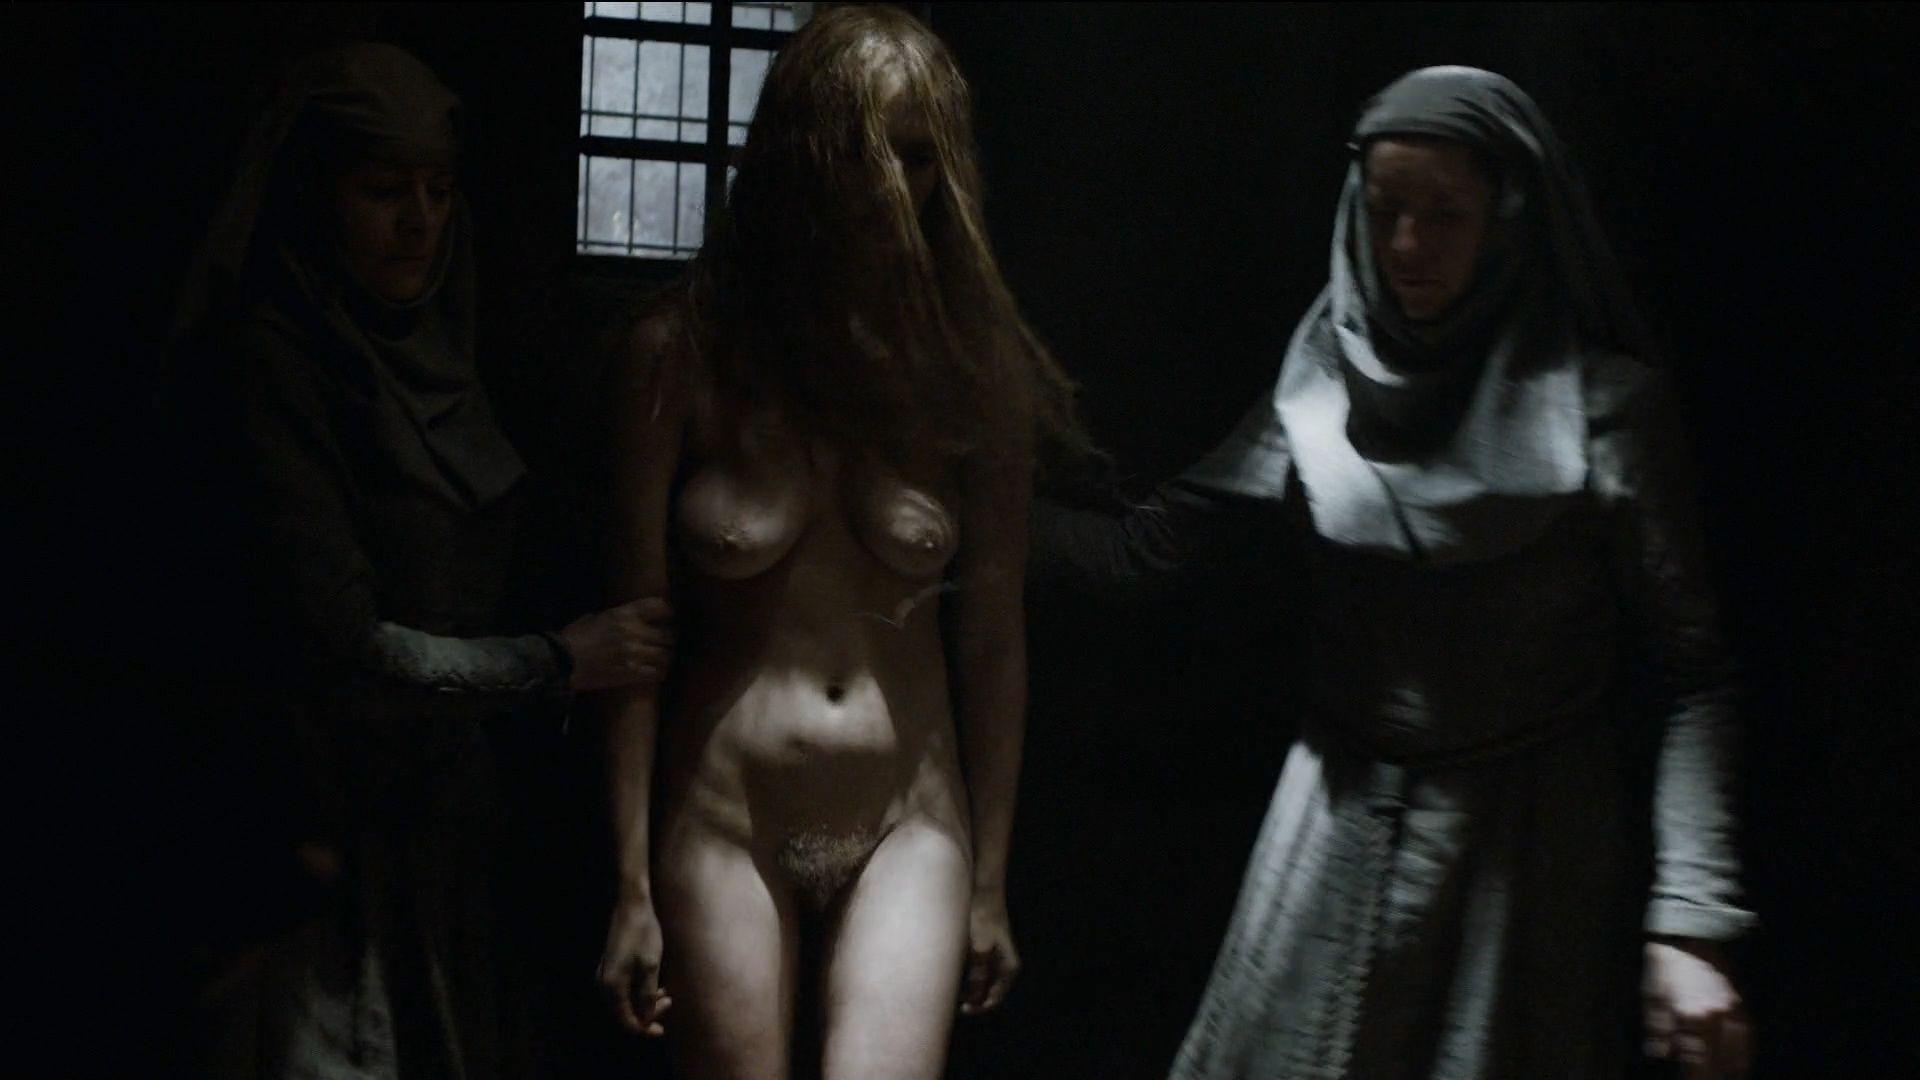 lena headey nude 300